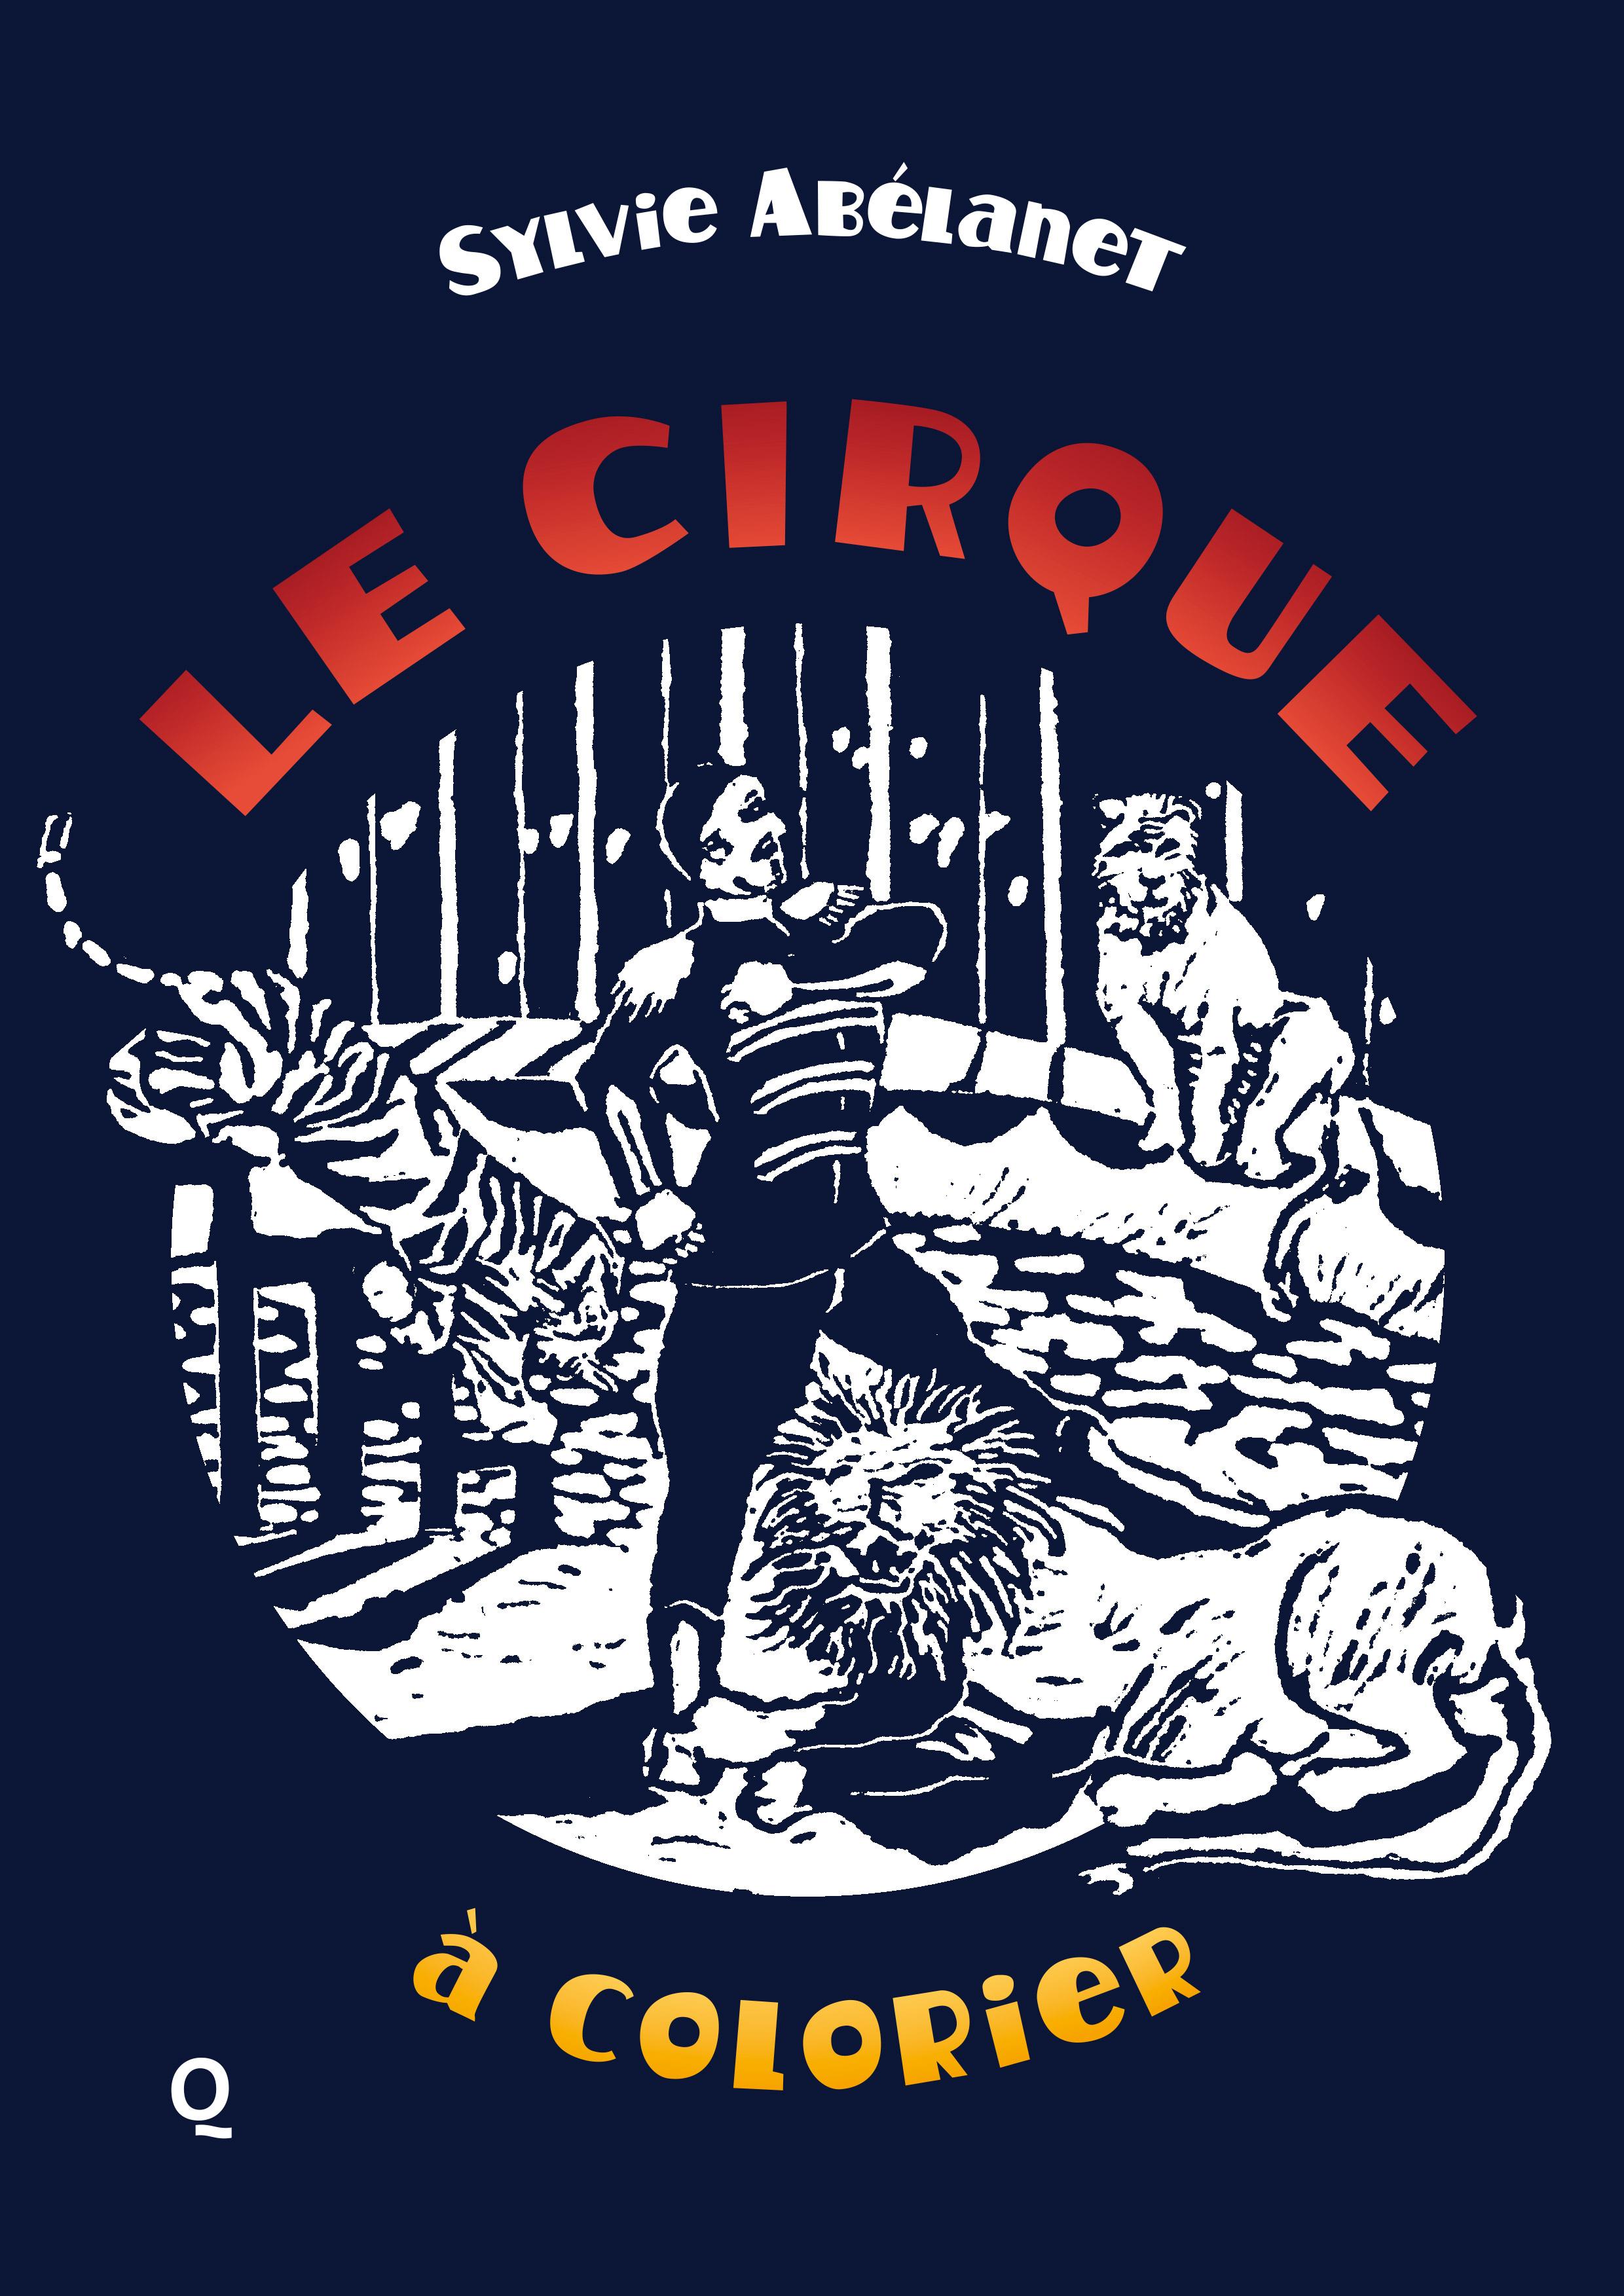 Coloriage Piste Cirque.Le Cirque A Colorier Qupe Editions